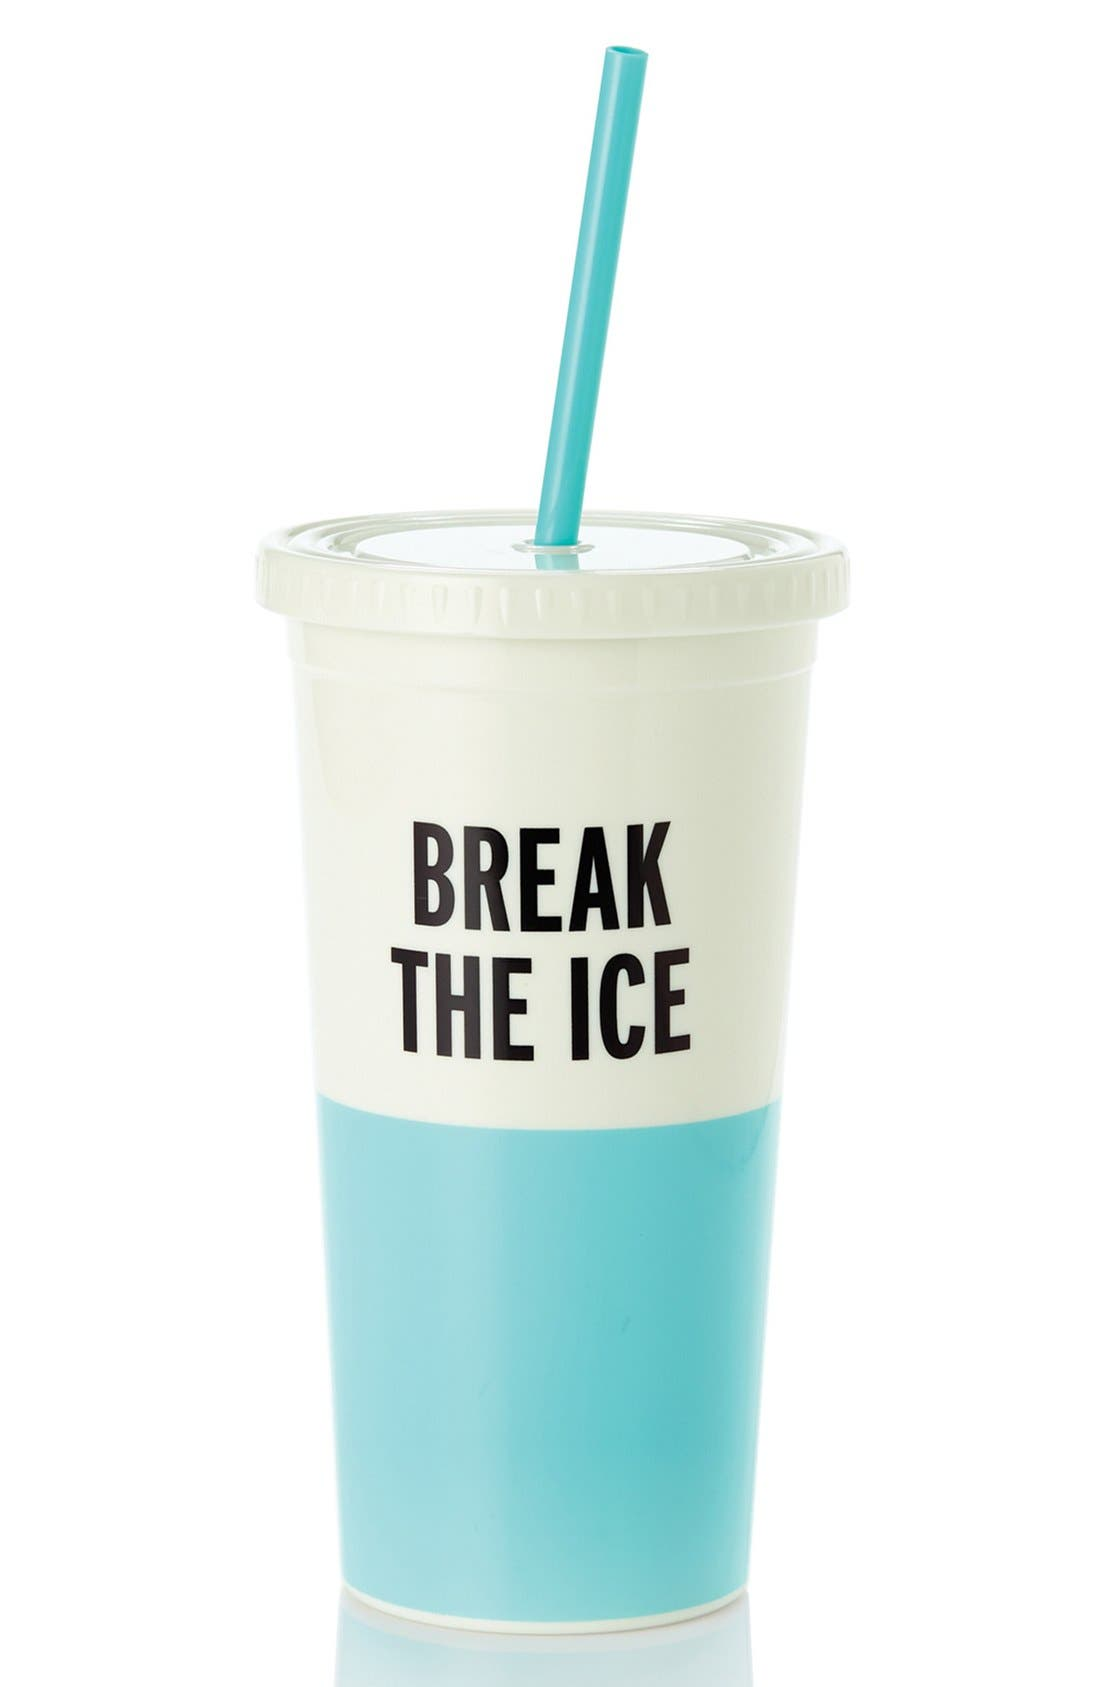 Alternate Image 1 Selected - kate spade new york 'break the ice' insulated tumbler